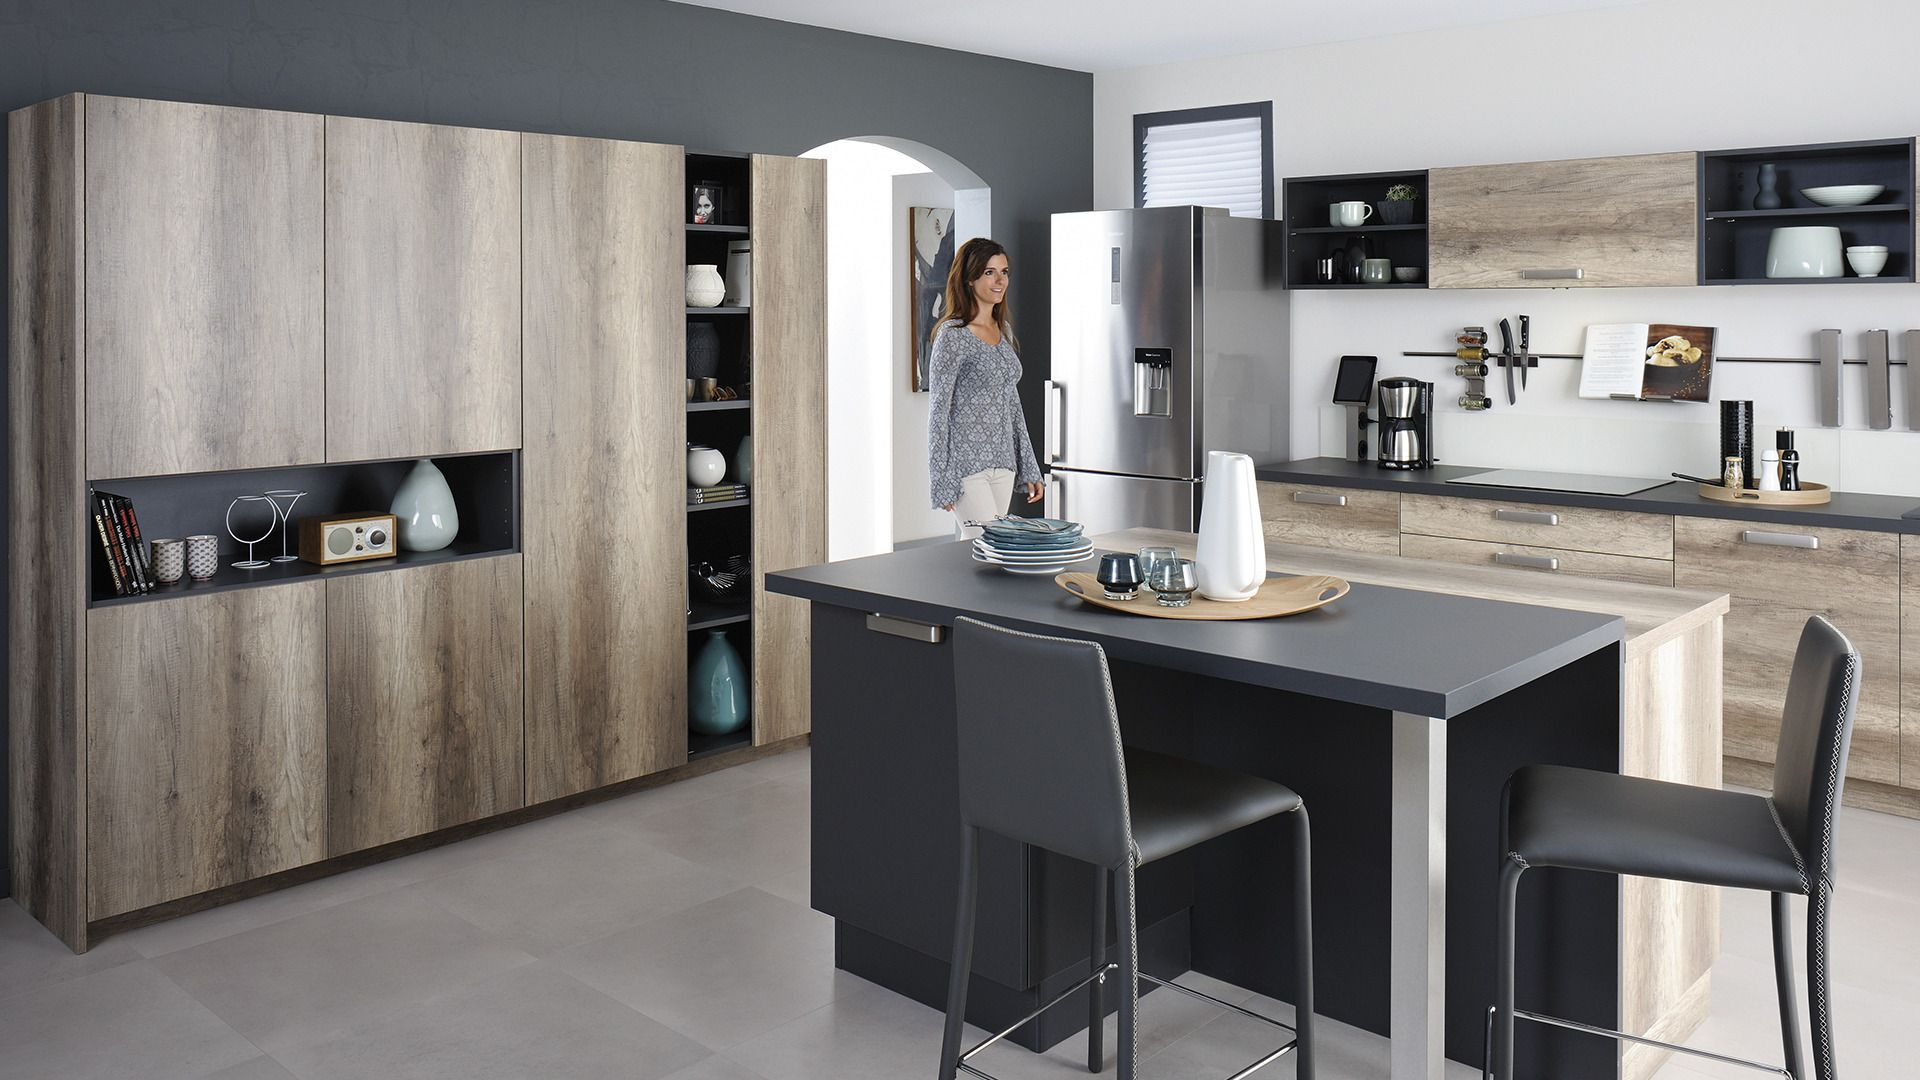 Epingle Par Anyitka Gnagy Sur Kitchens Dining En 2020